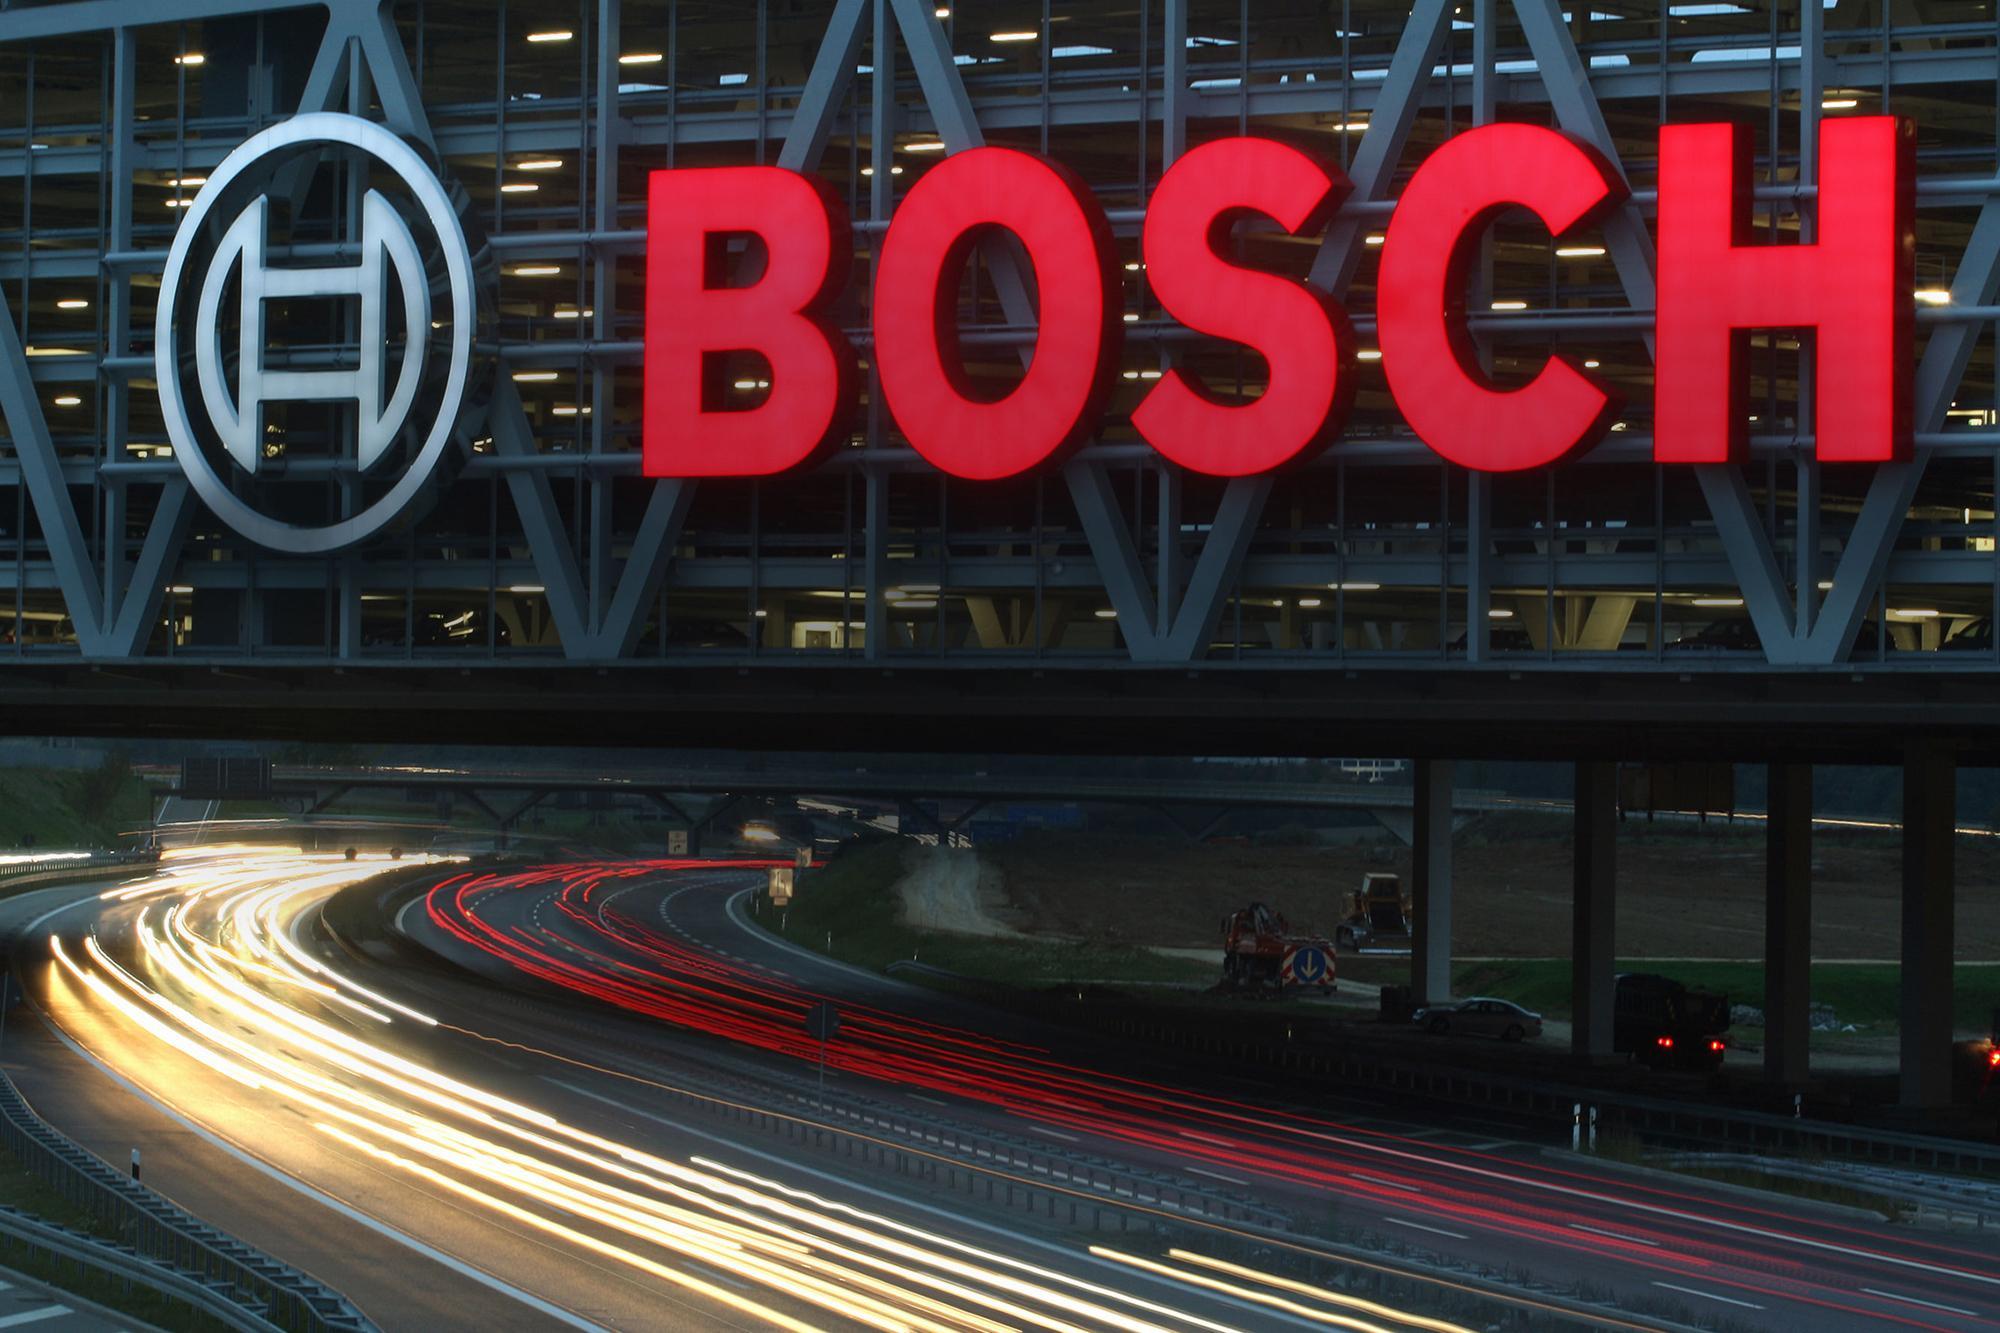 Bosch κατά Ευρωπαϊκής Ένωσης!